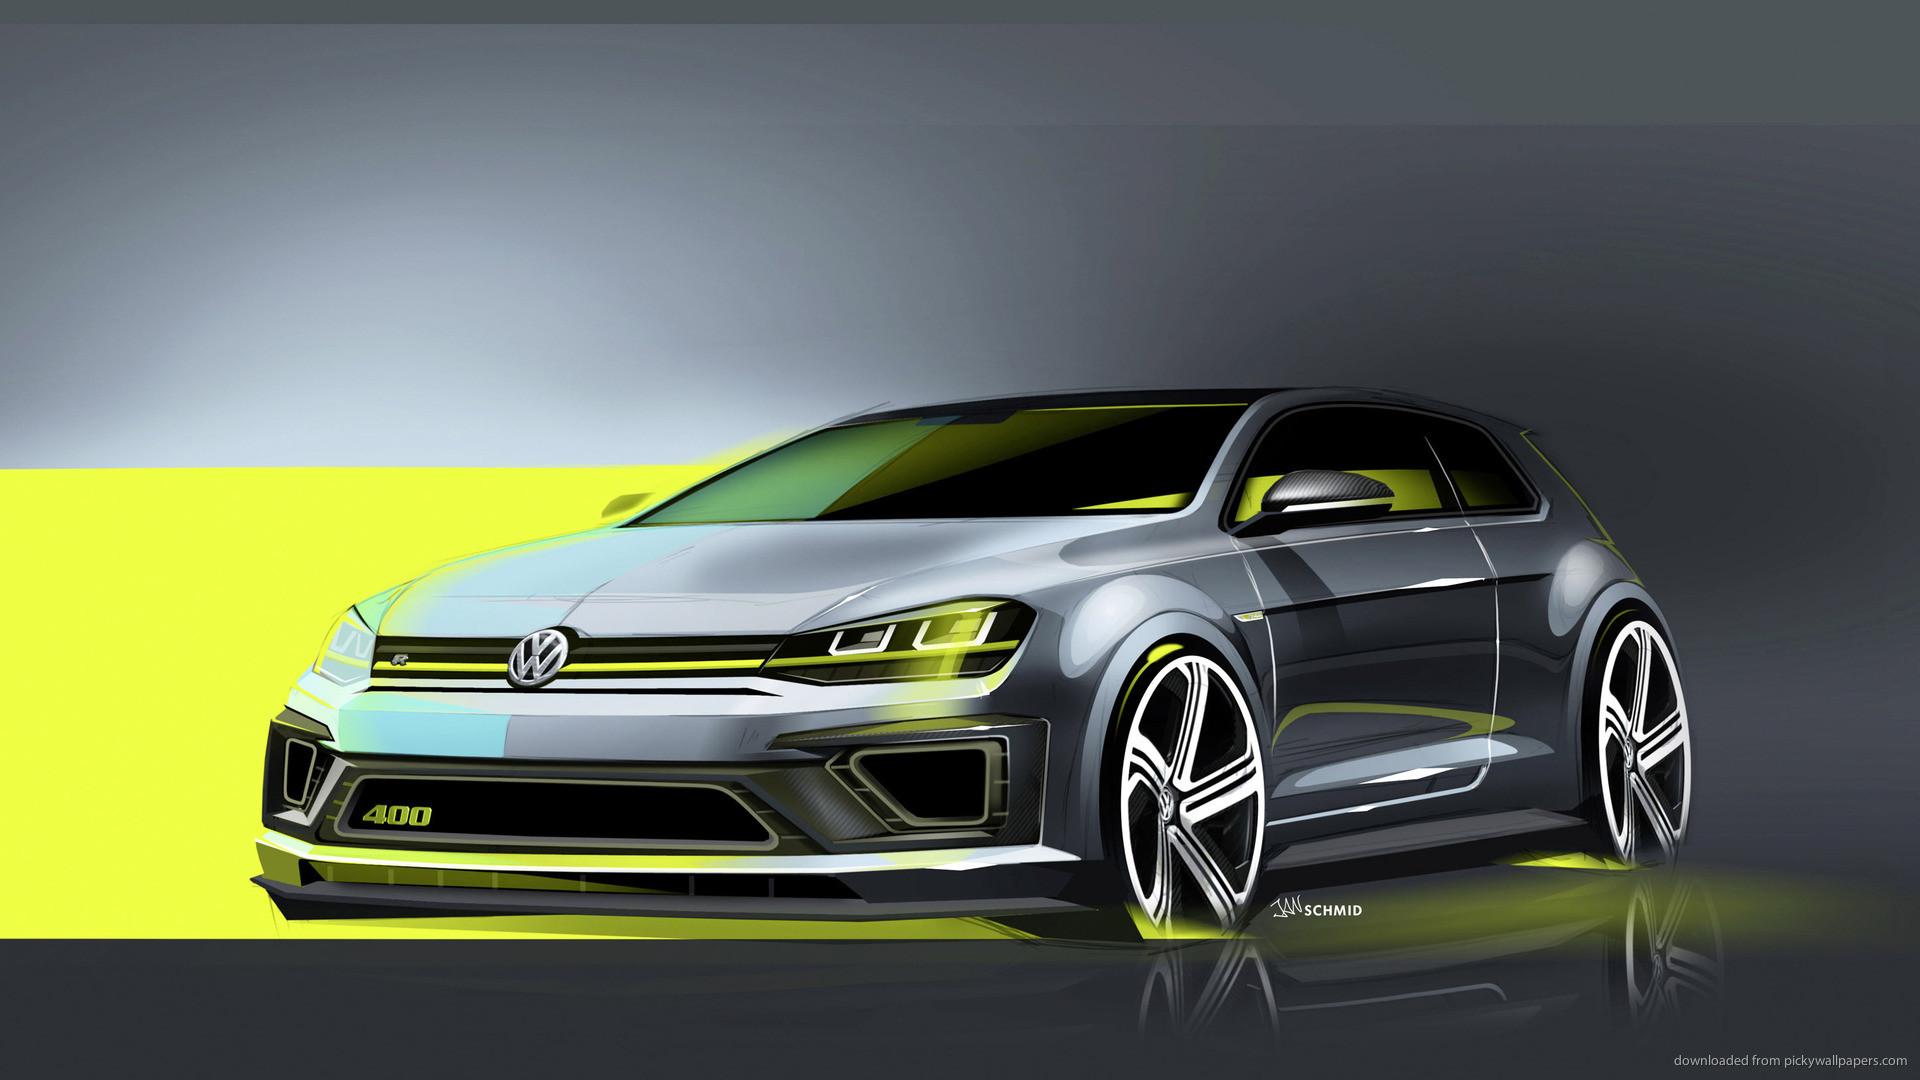 1920x1080 Volkswagen Golf R 400 Concept Car For